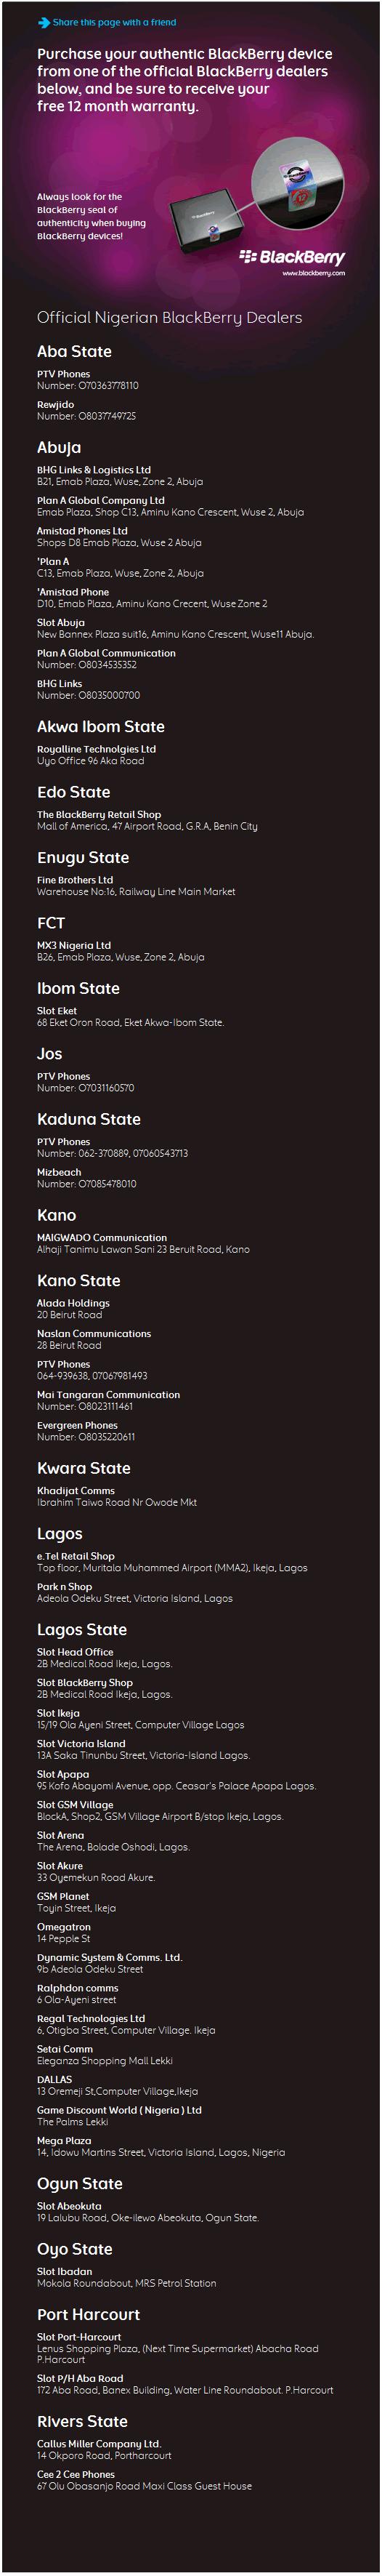 List Of Authentic BlackBerry Dealers In Nigeria